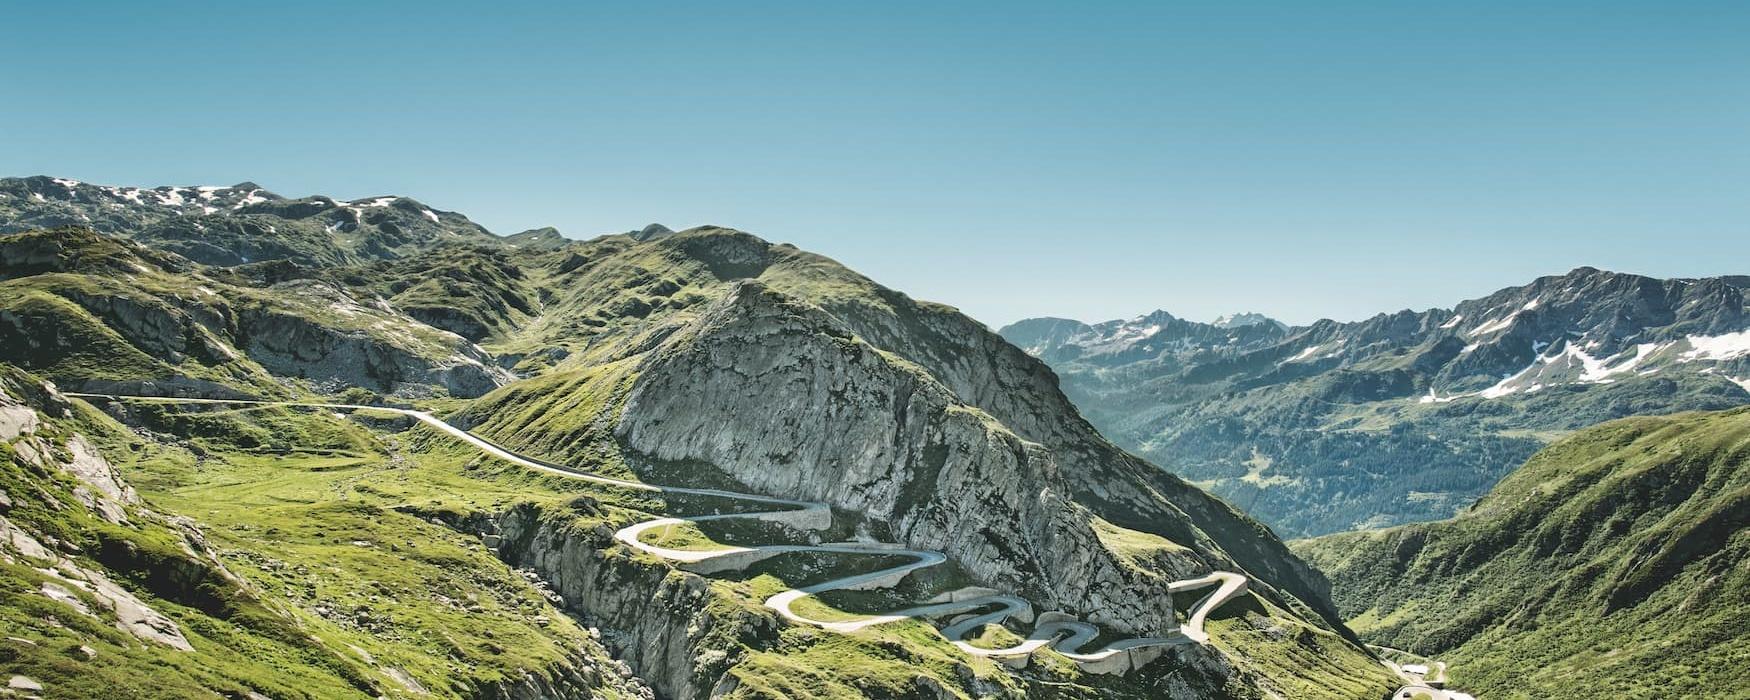 Schweiz Tourismus/ Nico Schaerer